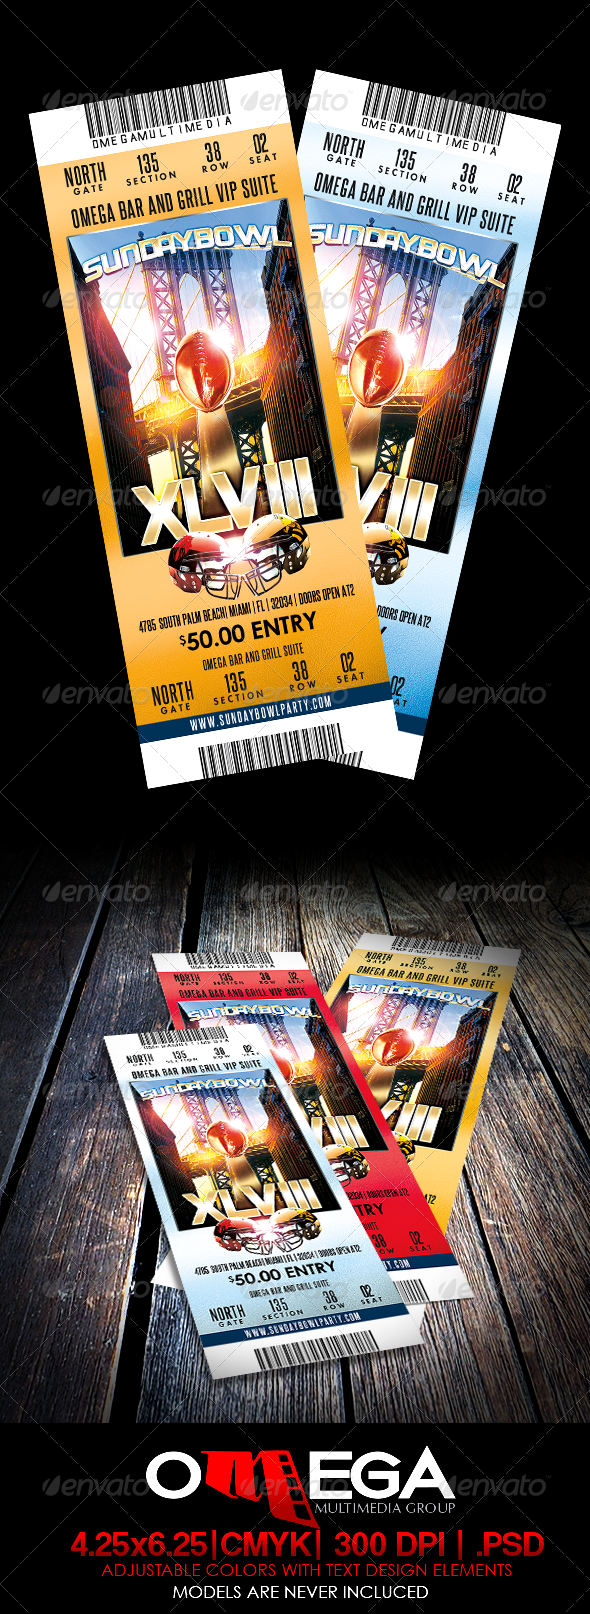 GraphicRiver SundayBowl Flyer Ticket 6288240